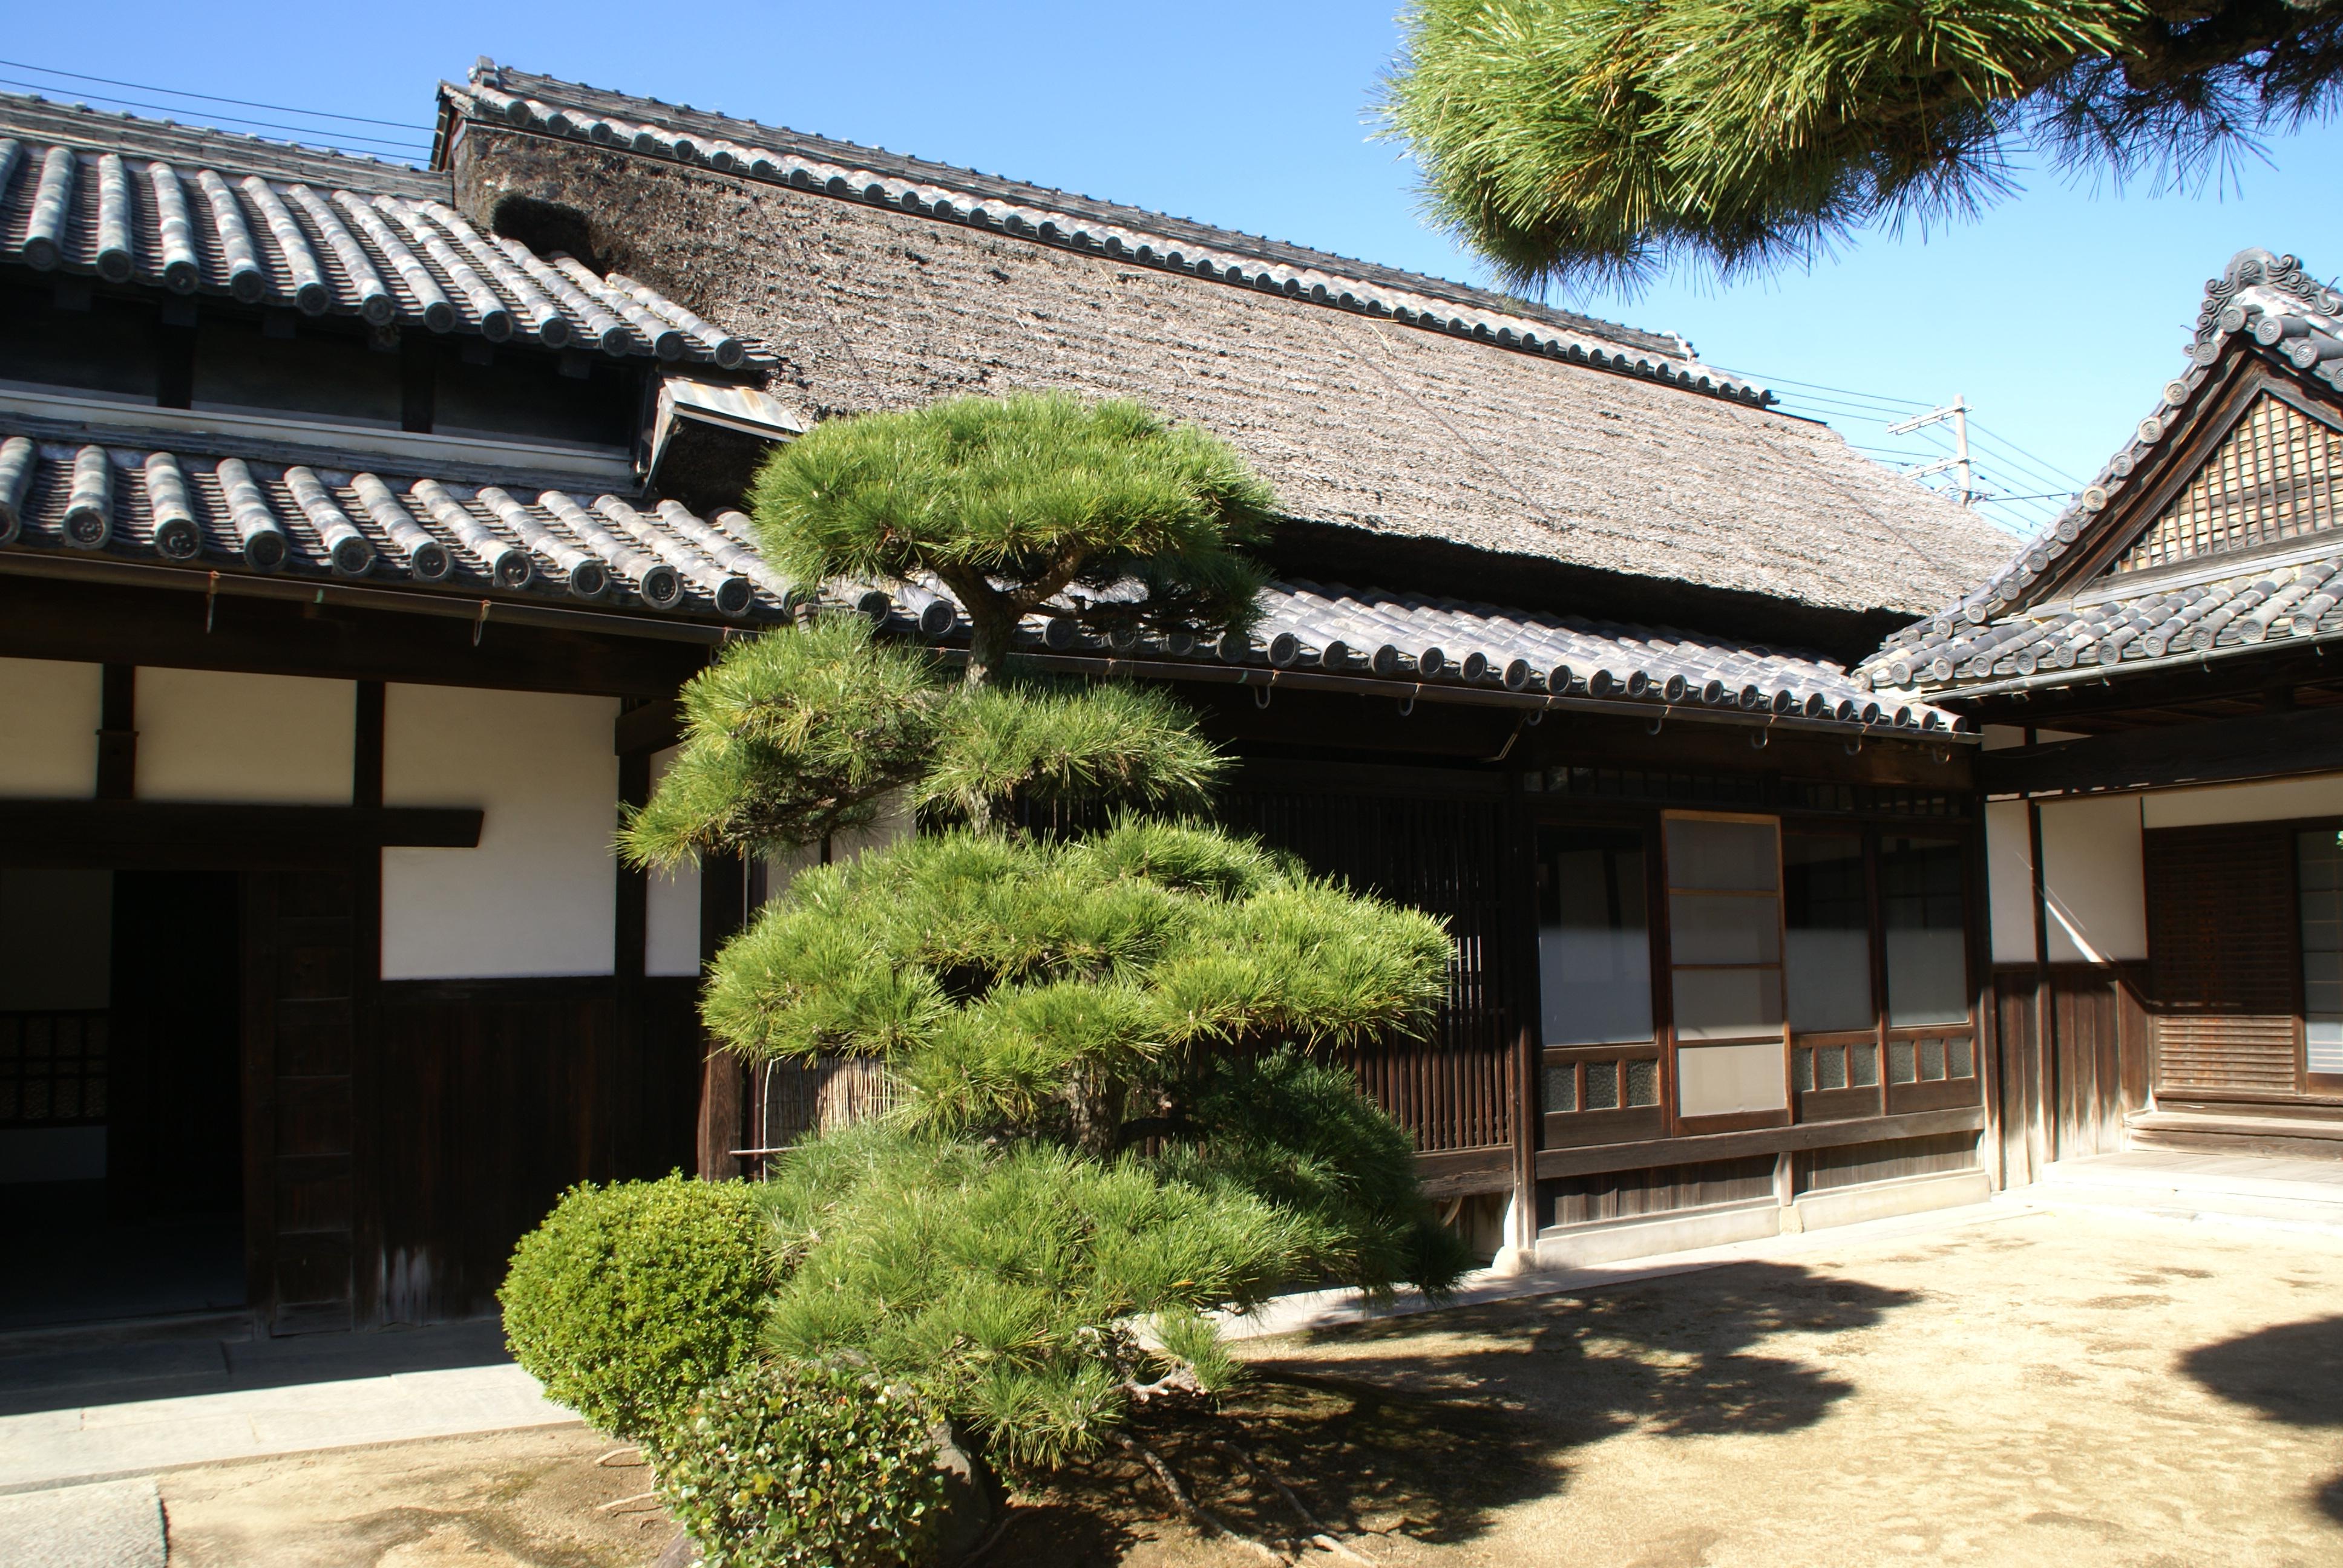 <p>主屋の茅葺屋根</p>居室部が茅葺、土間部が本瓦葺・つし2階建。居室部が整った19世紀前期頃の完成とみられる。